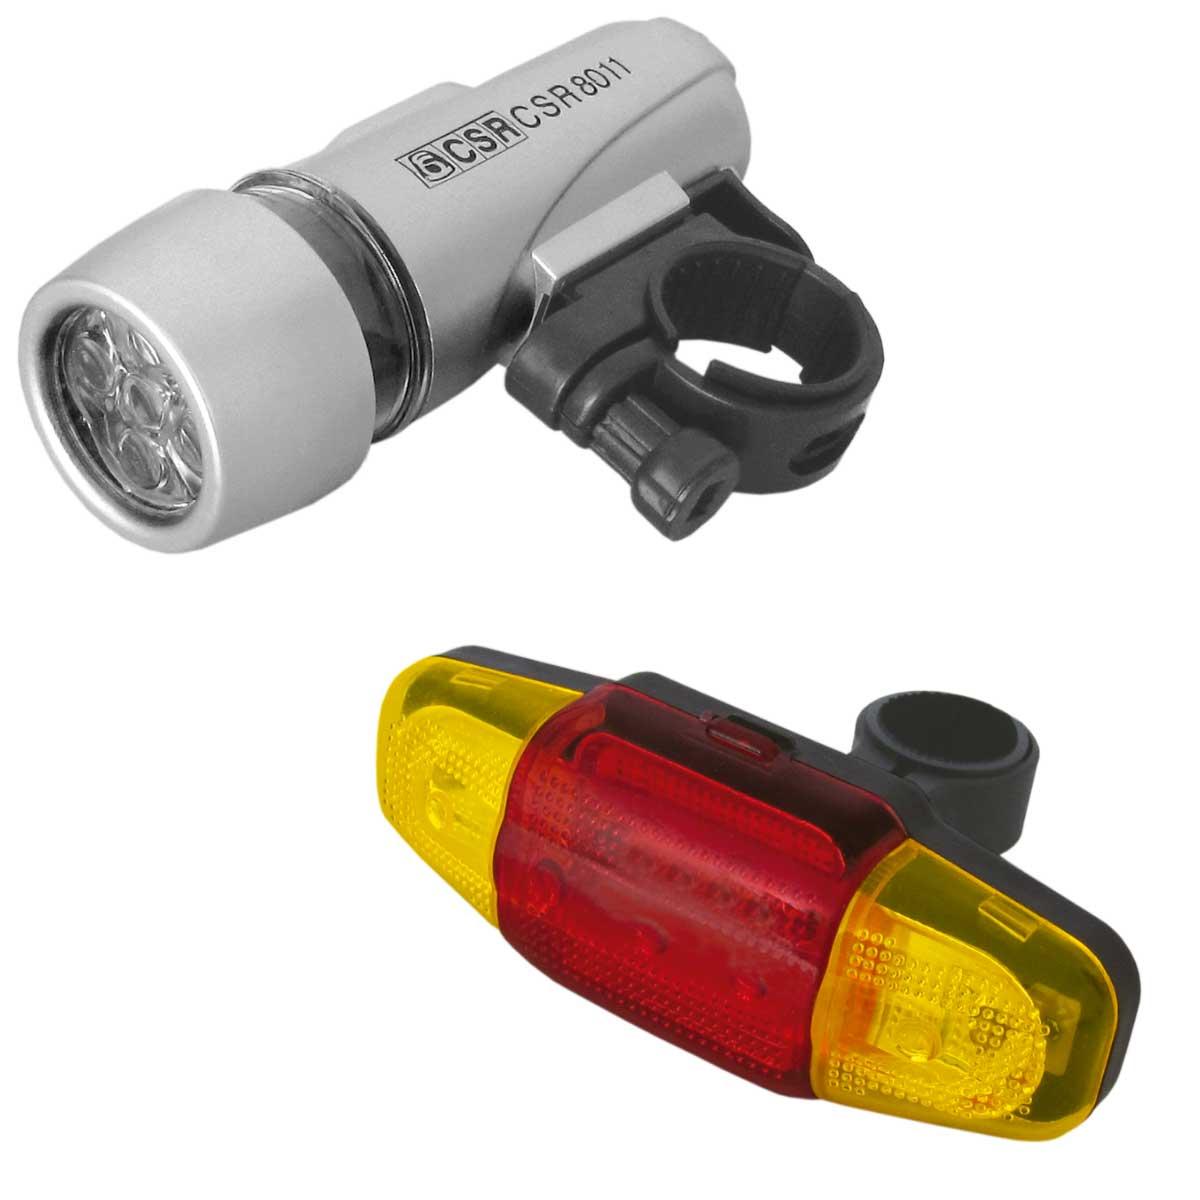 HX8011 - Kit de Lanternas para Bicicleta 5 LEDs HX 8011 - CSR